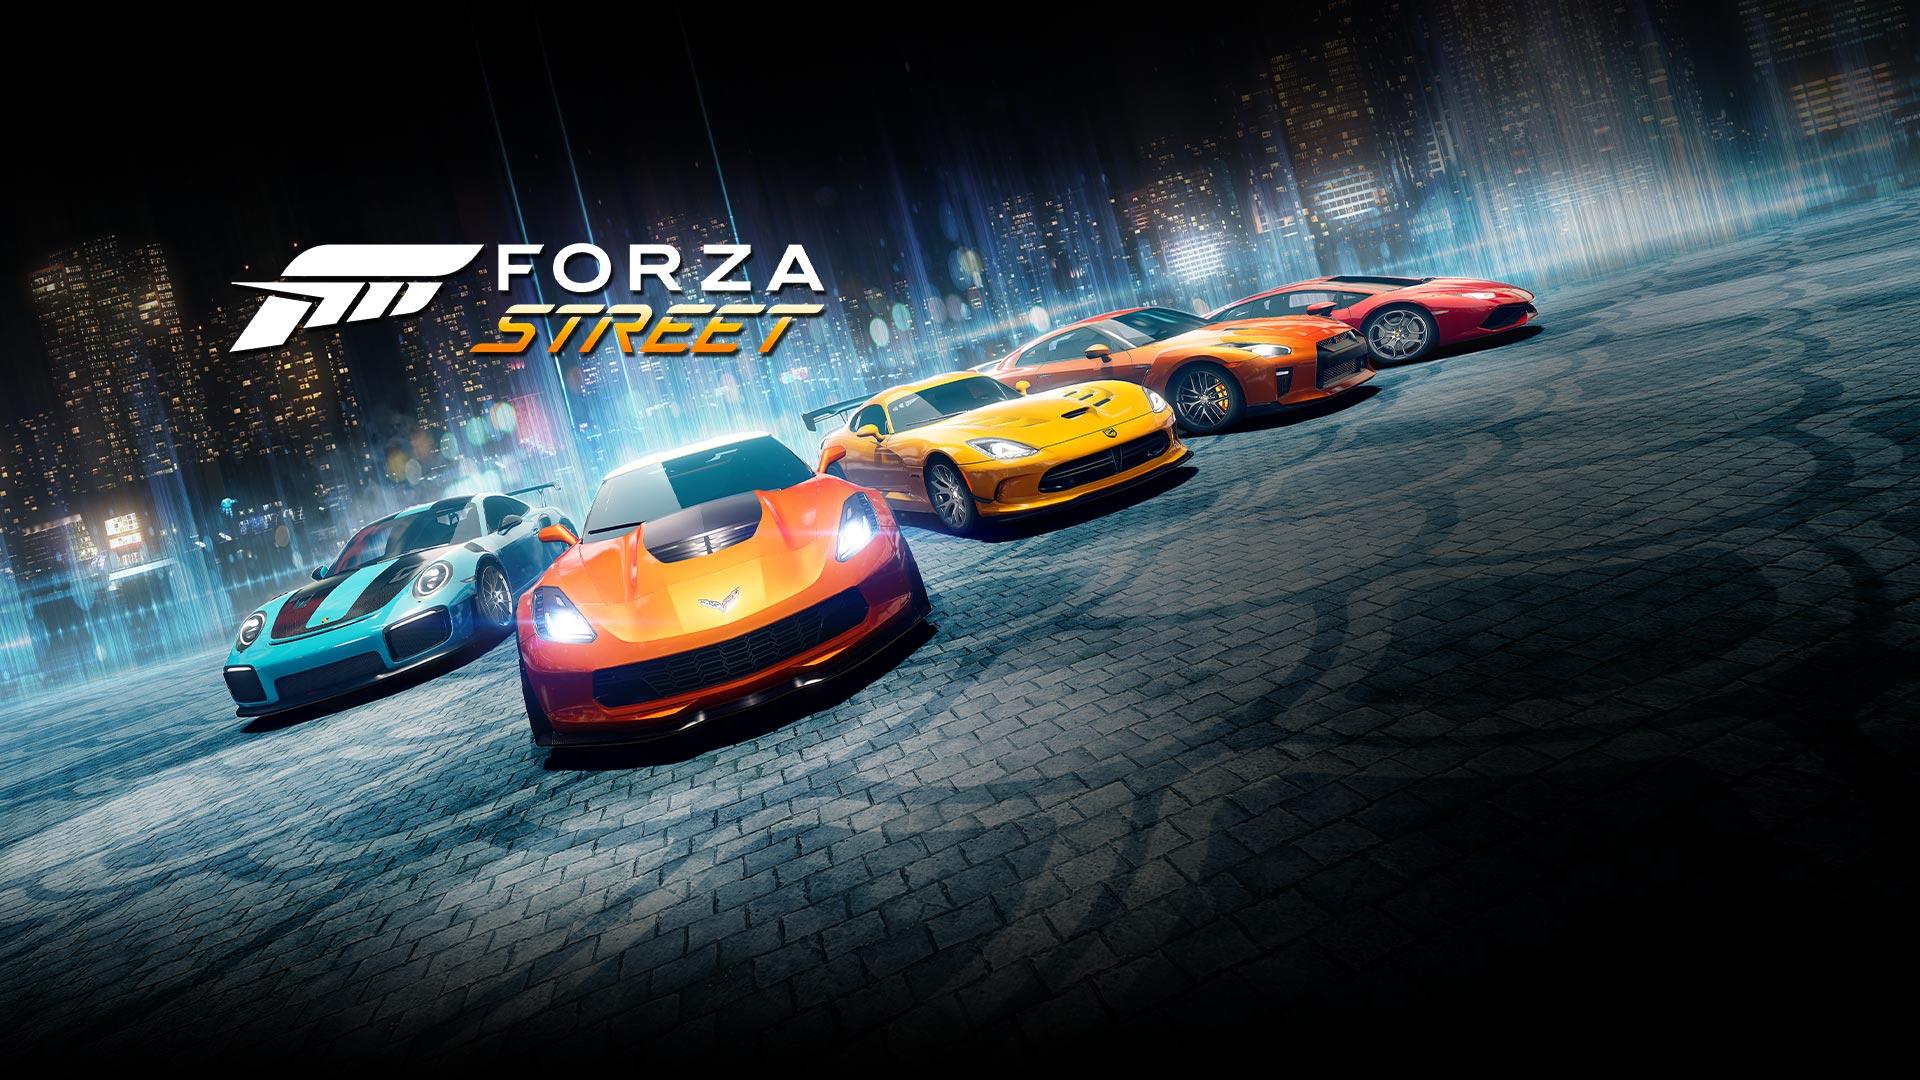 ¡El prerregistro de Forza Street empezó para Android!